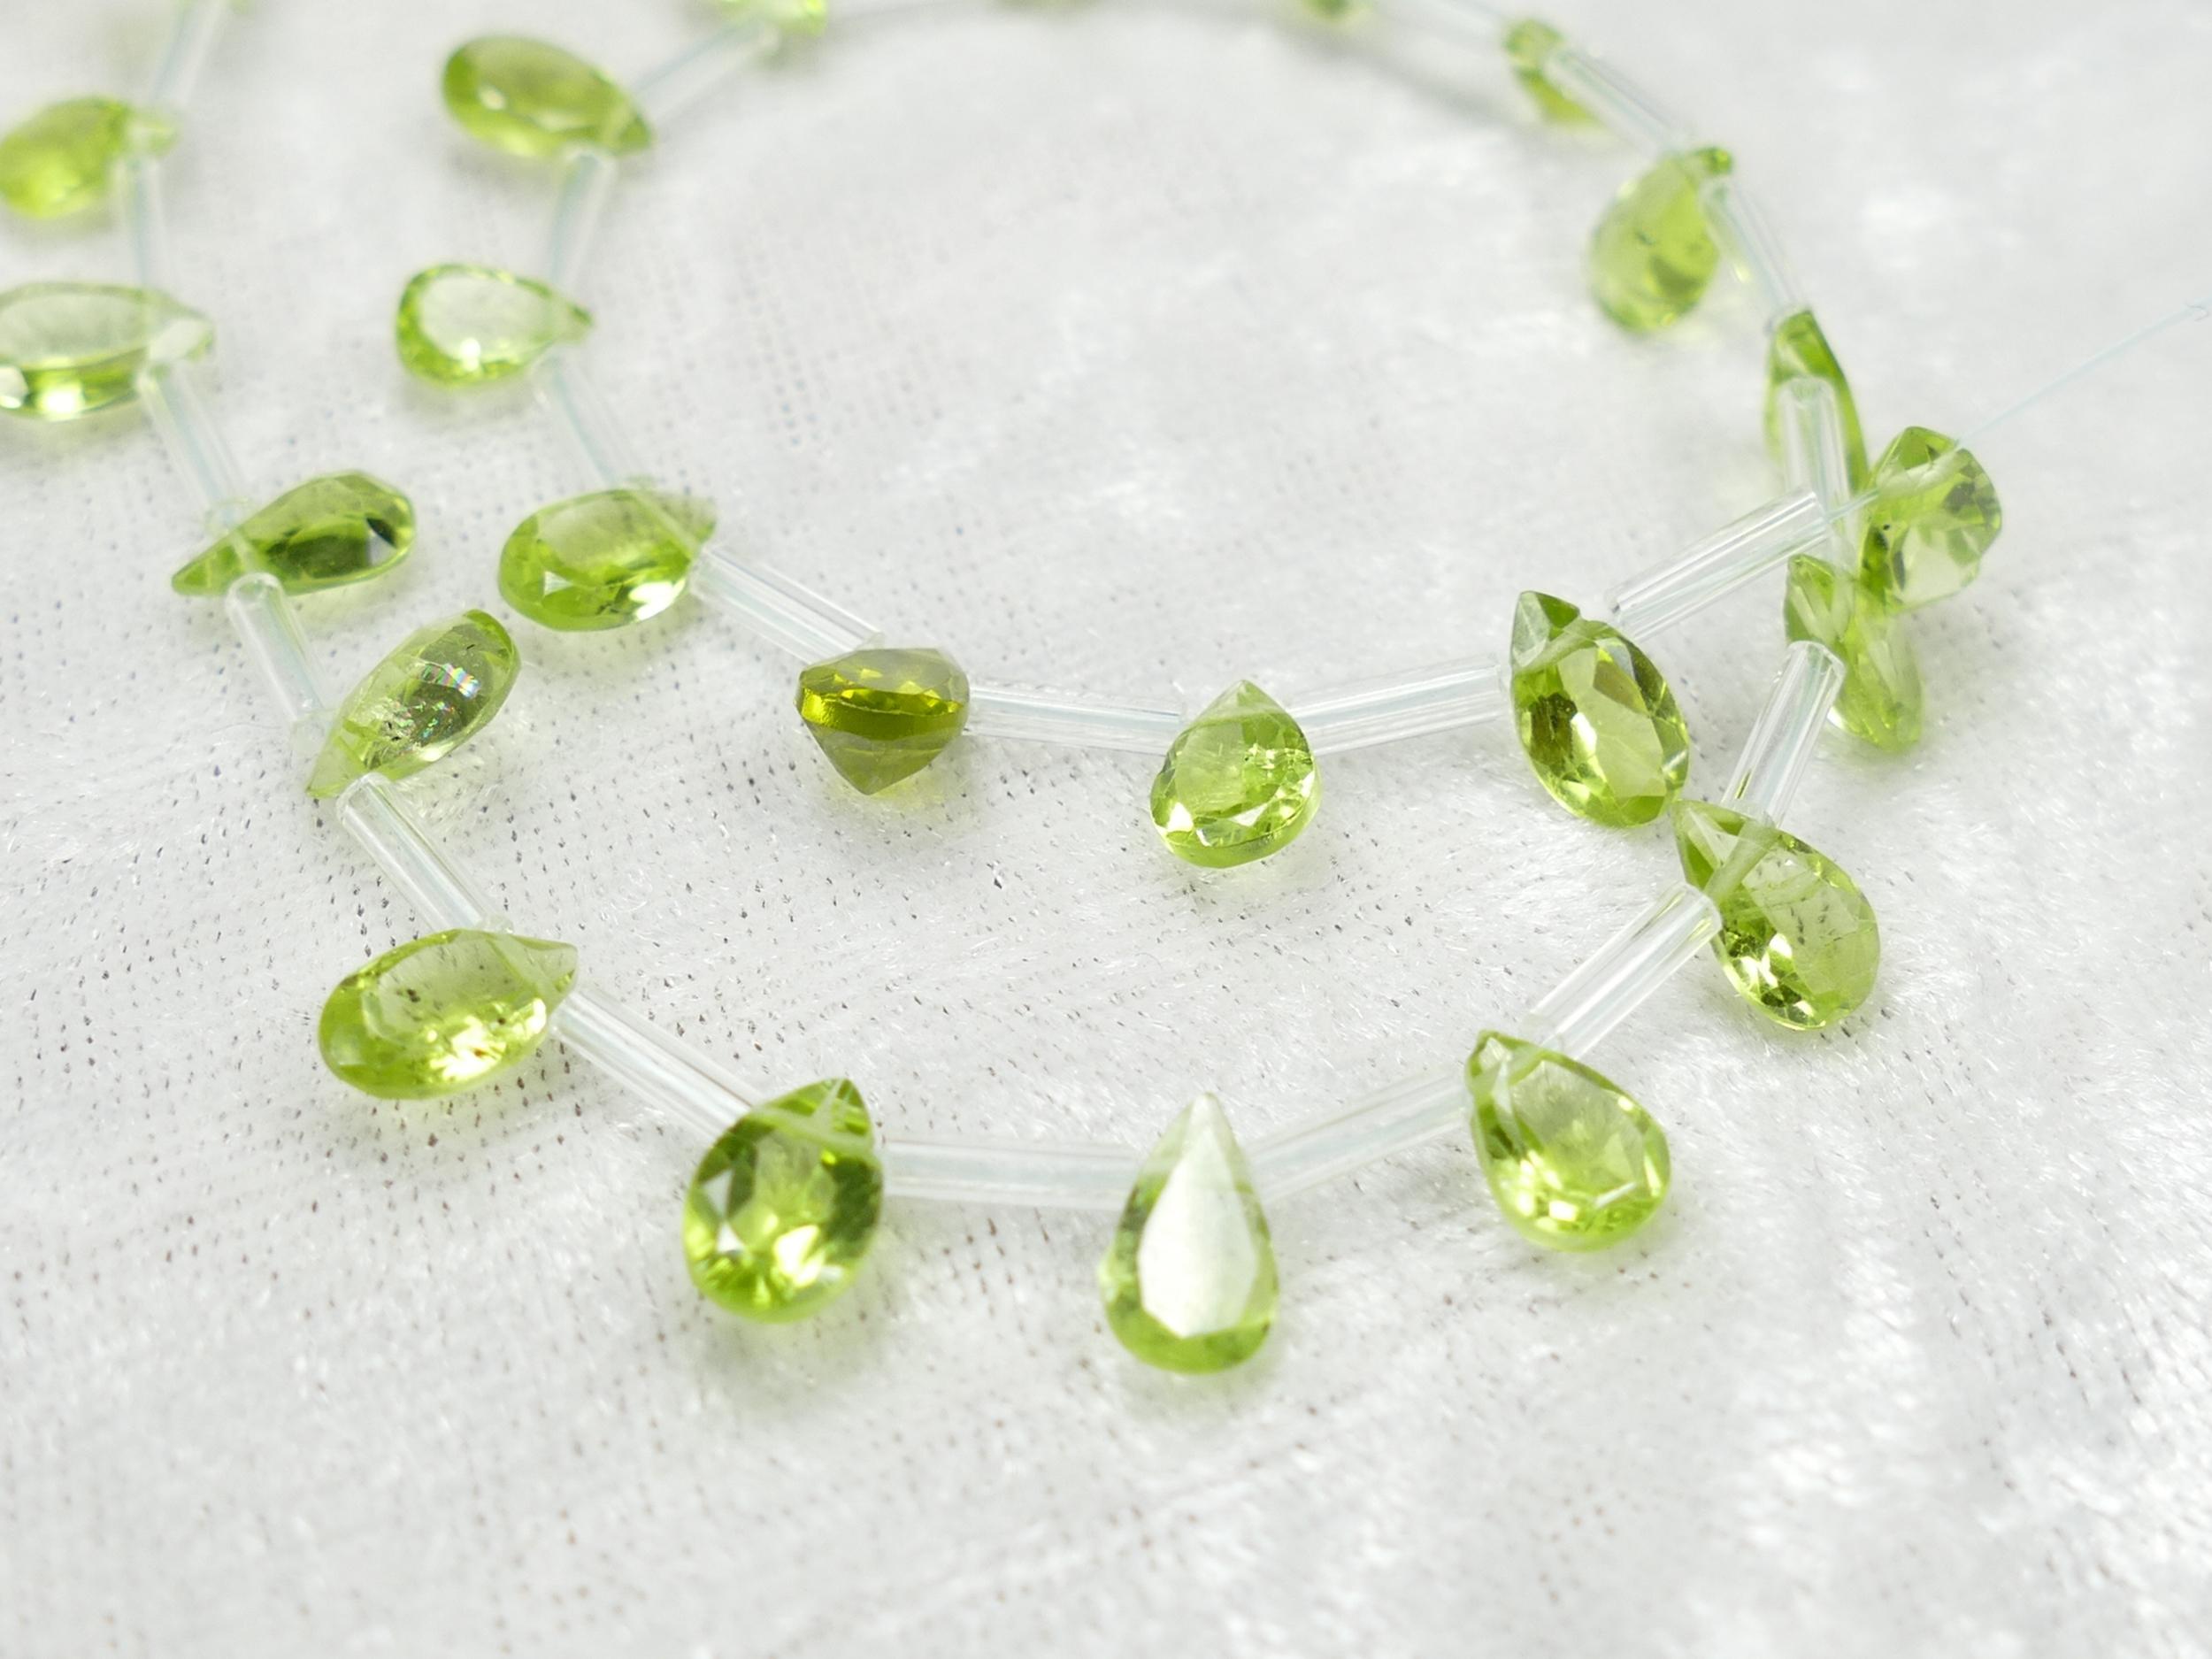 7x5mm AA/AAA x8 Perles de Péridot naturel en poire facettée (#AC982)